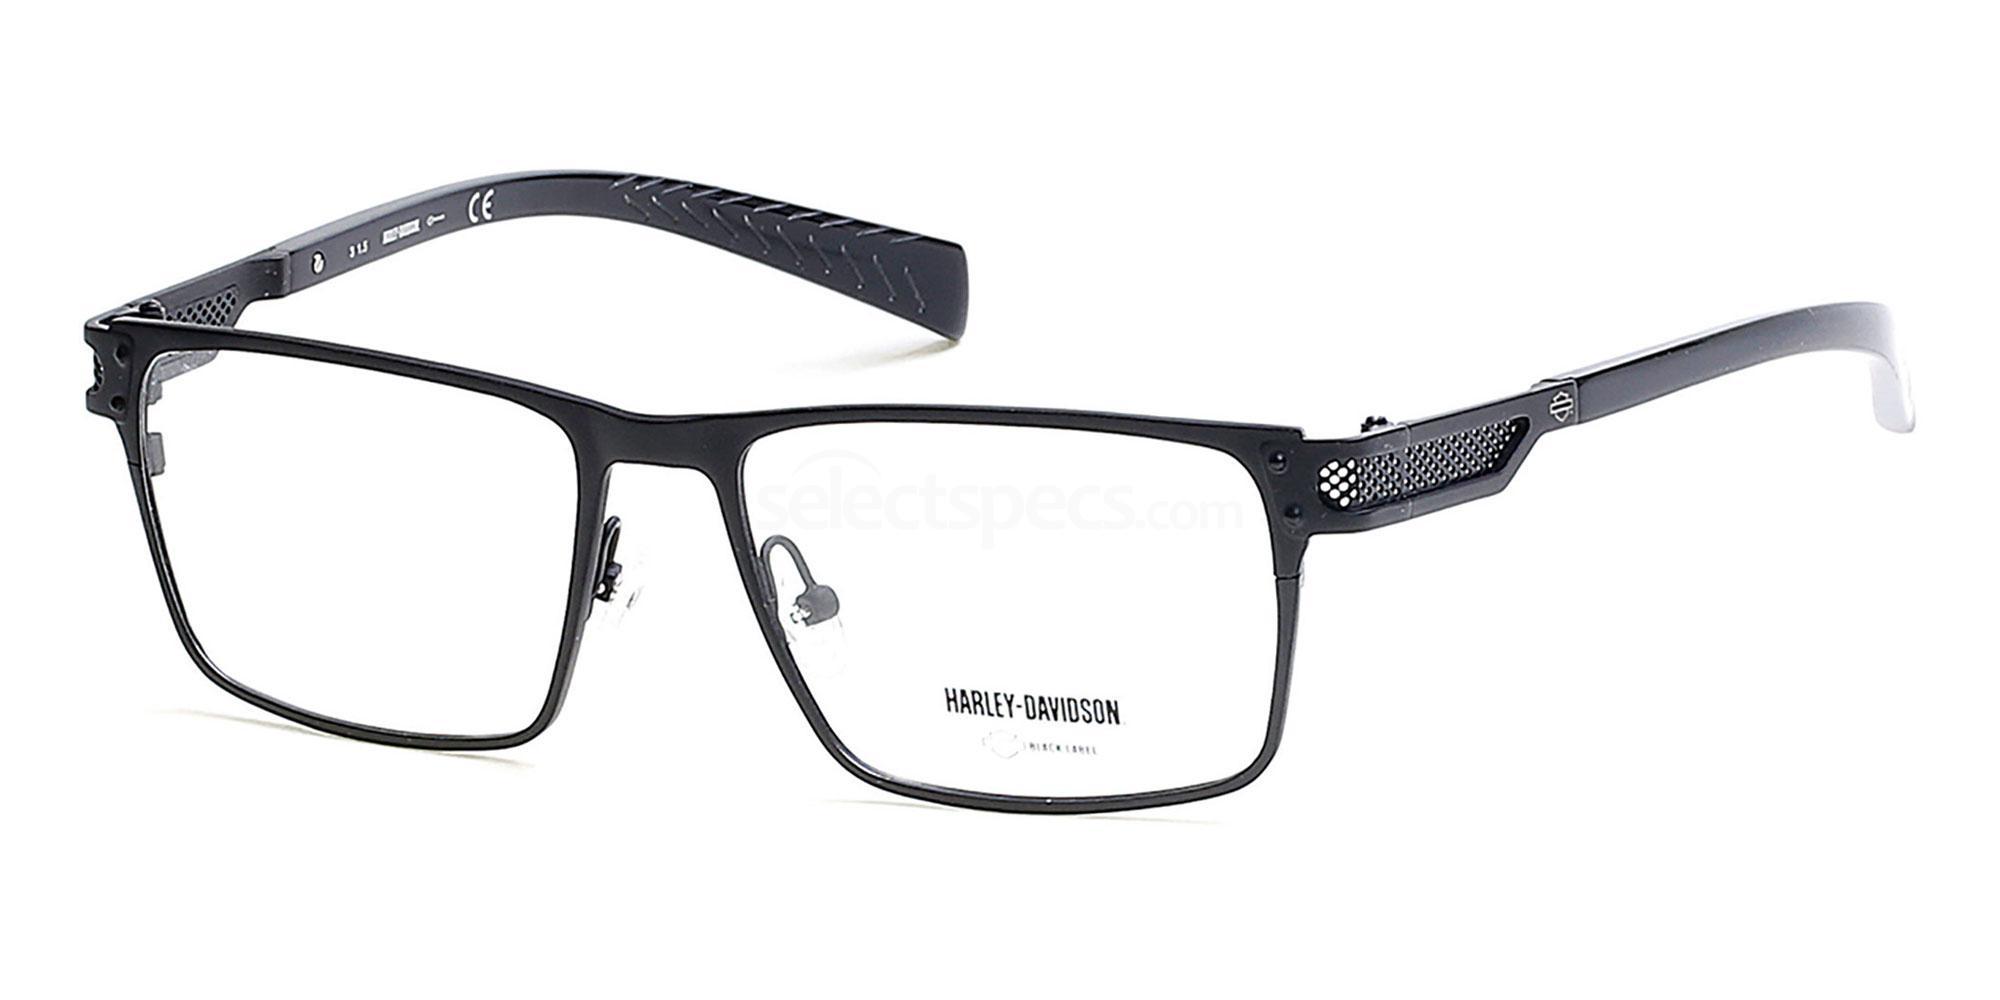 001 HD 1032 Glasses, Harley Davidson